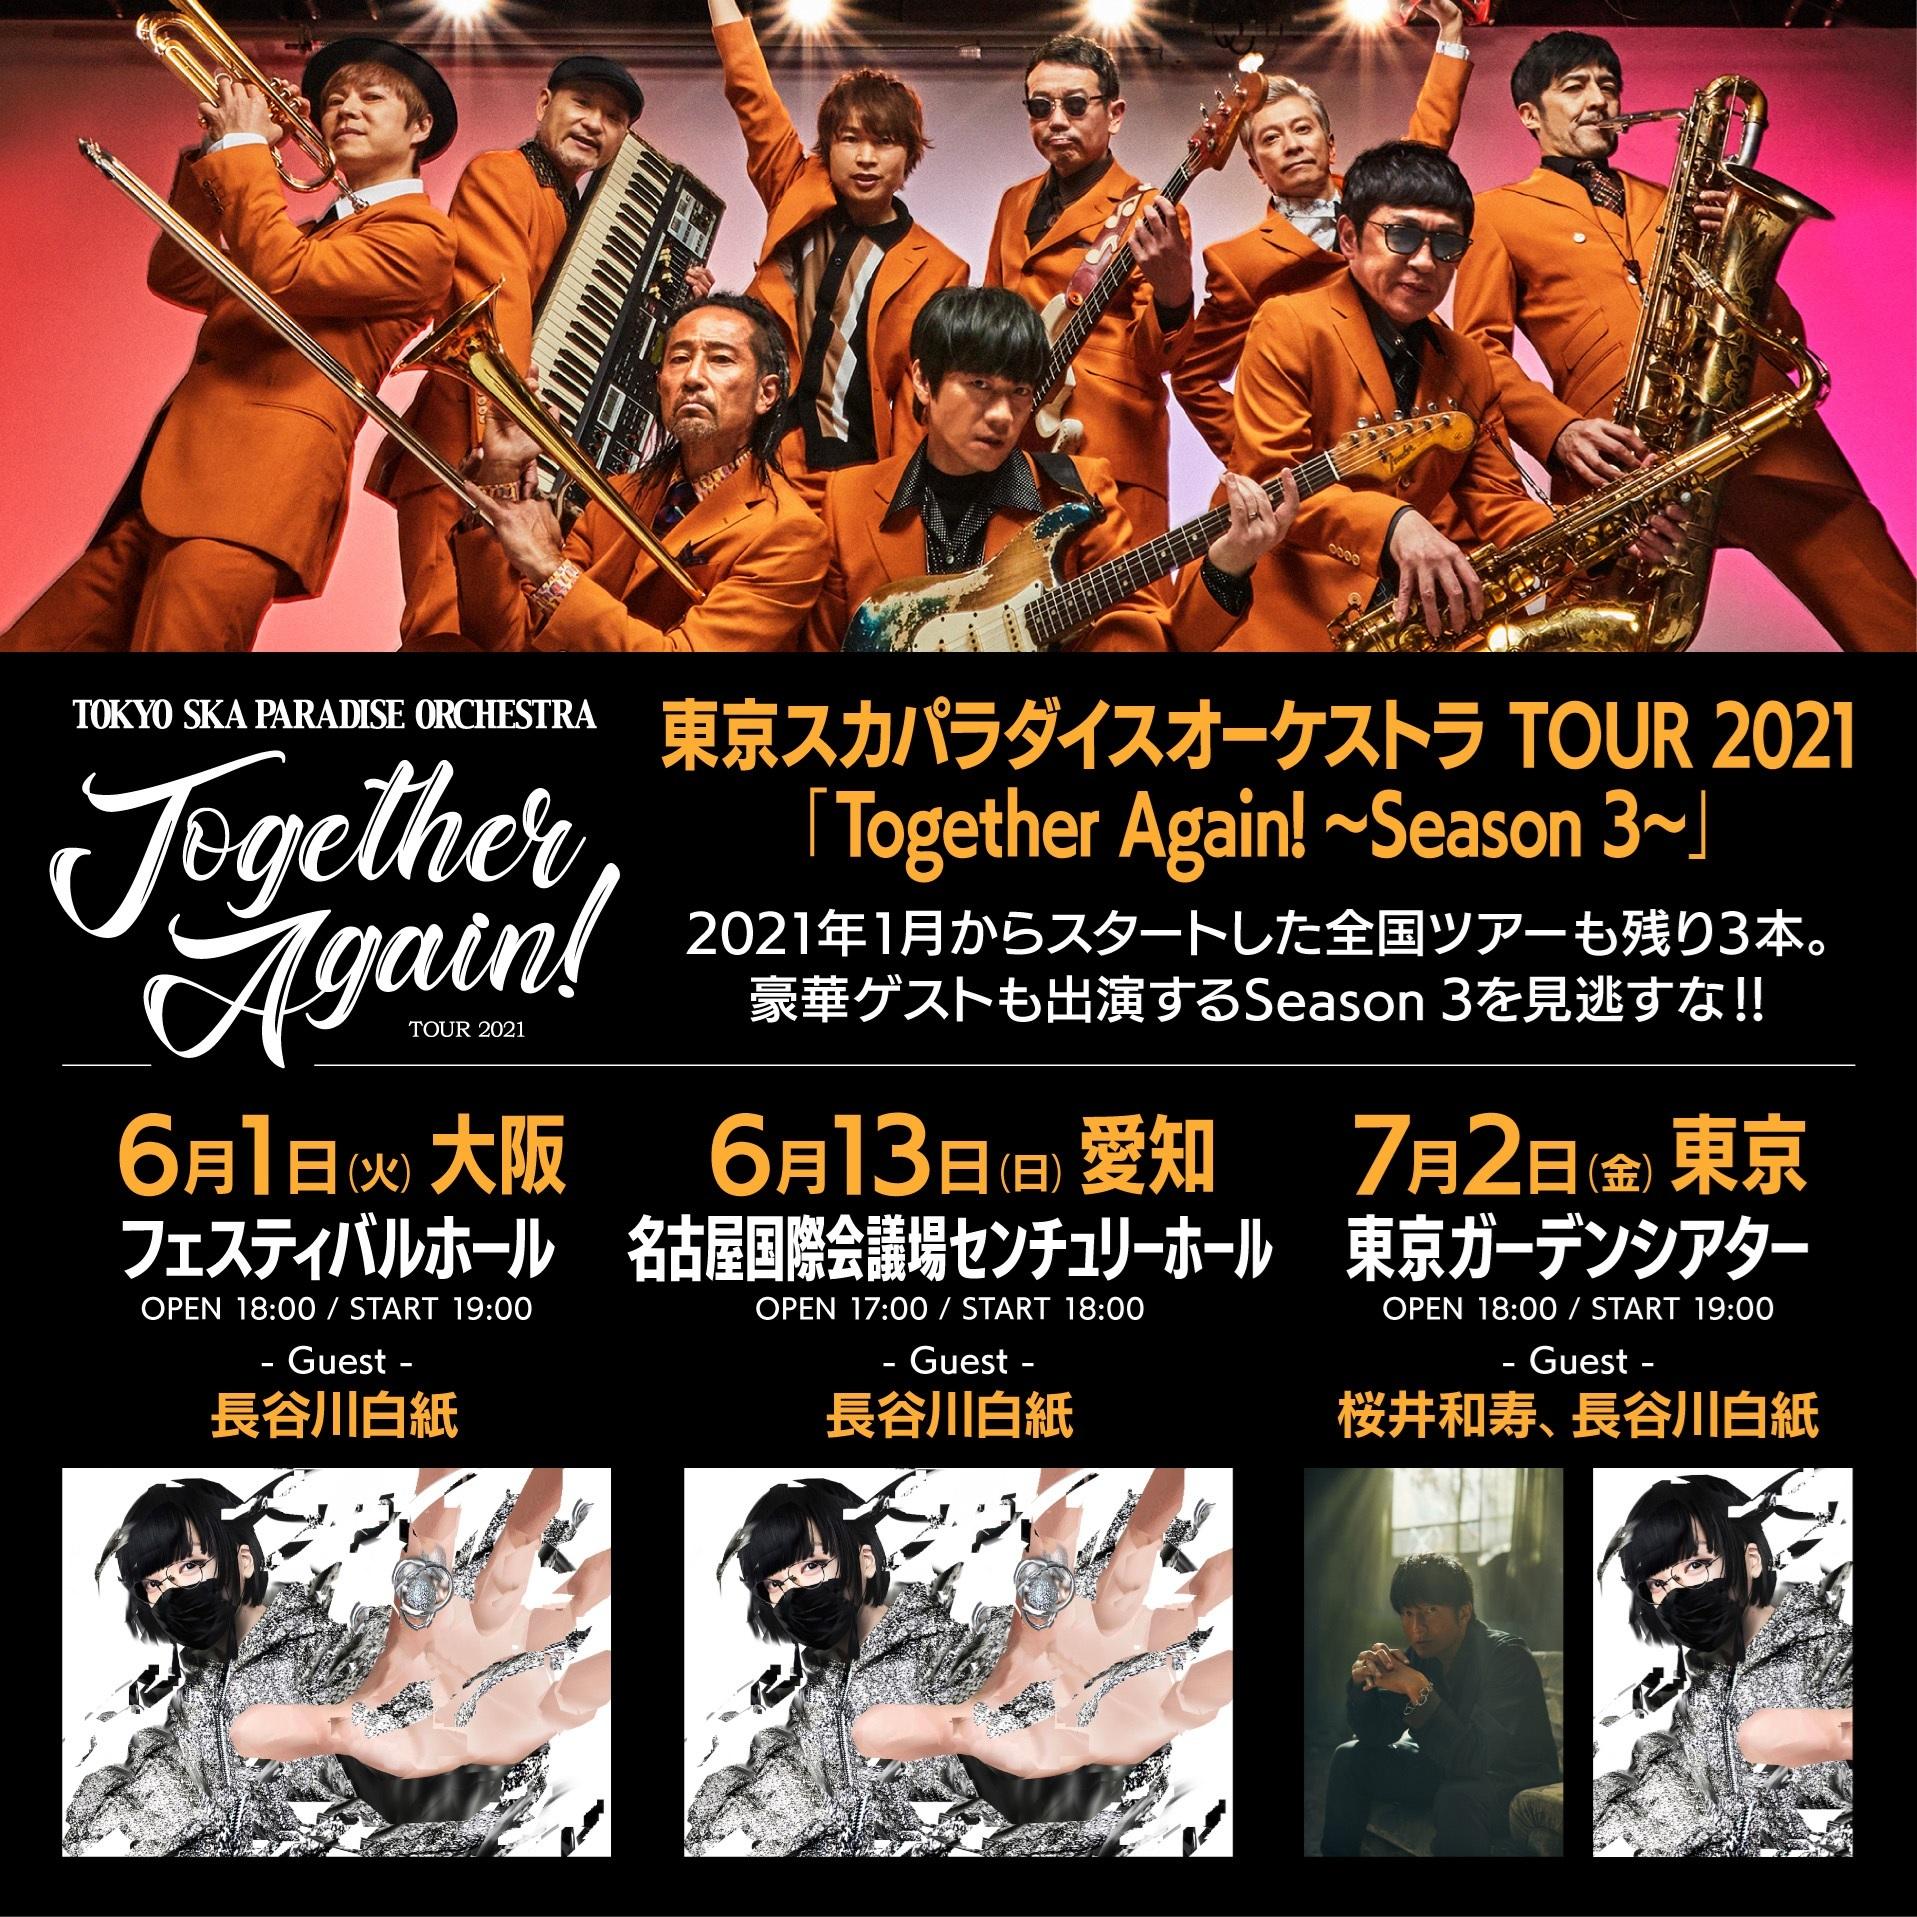 『Together Again! ~Season 3~』フライヤー